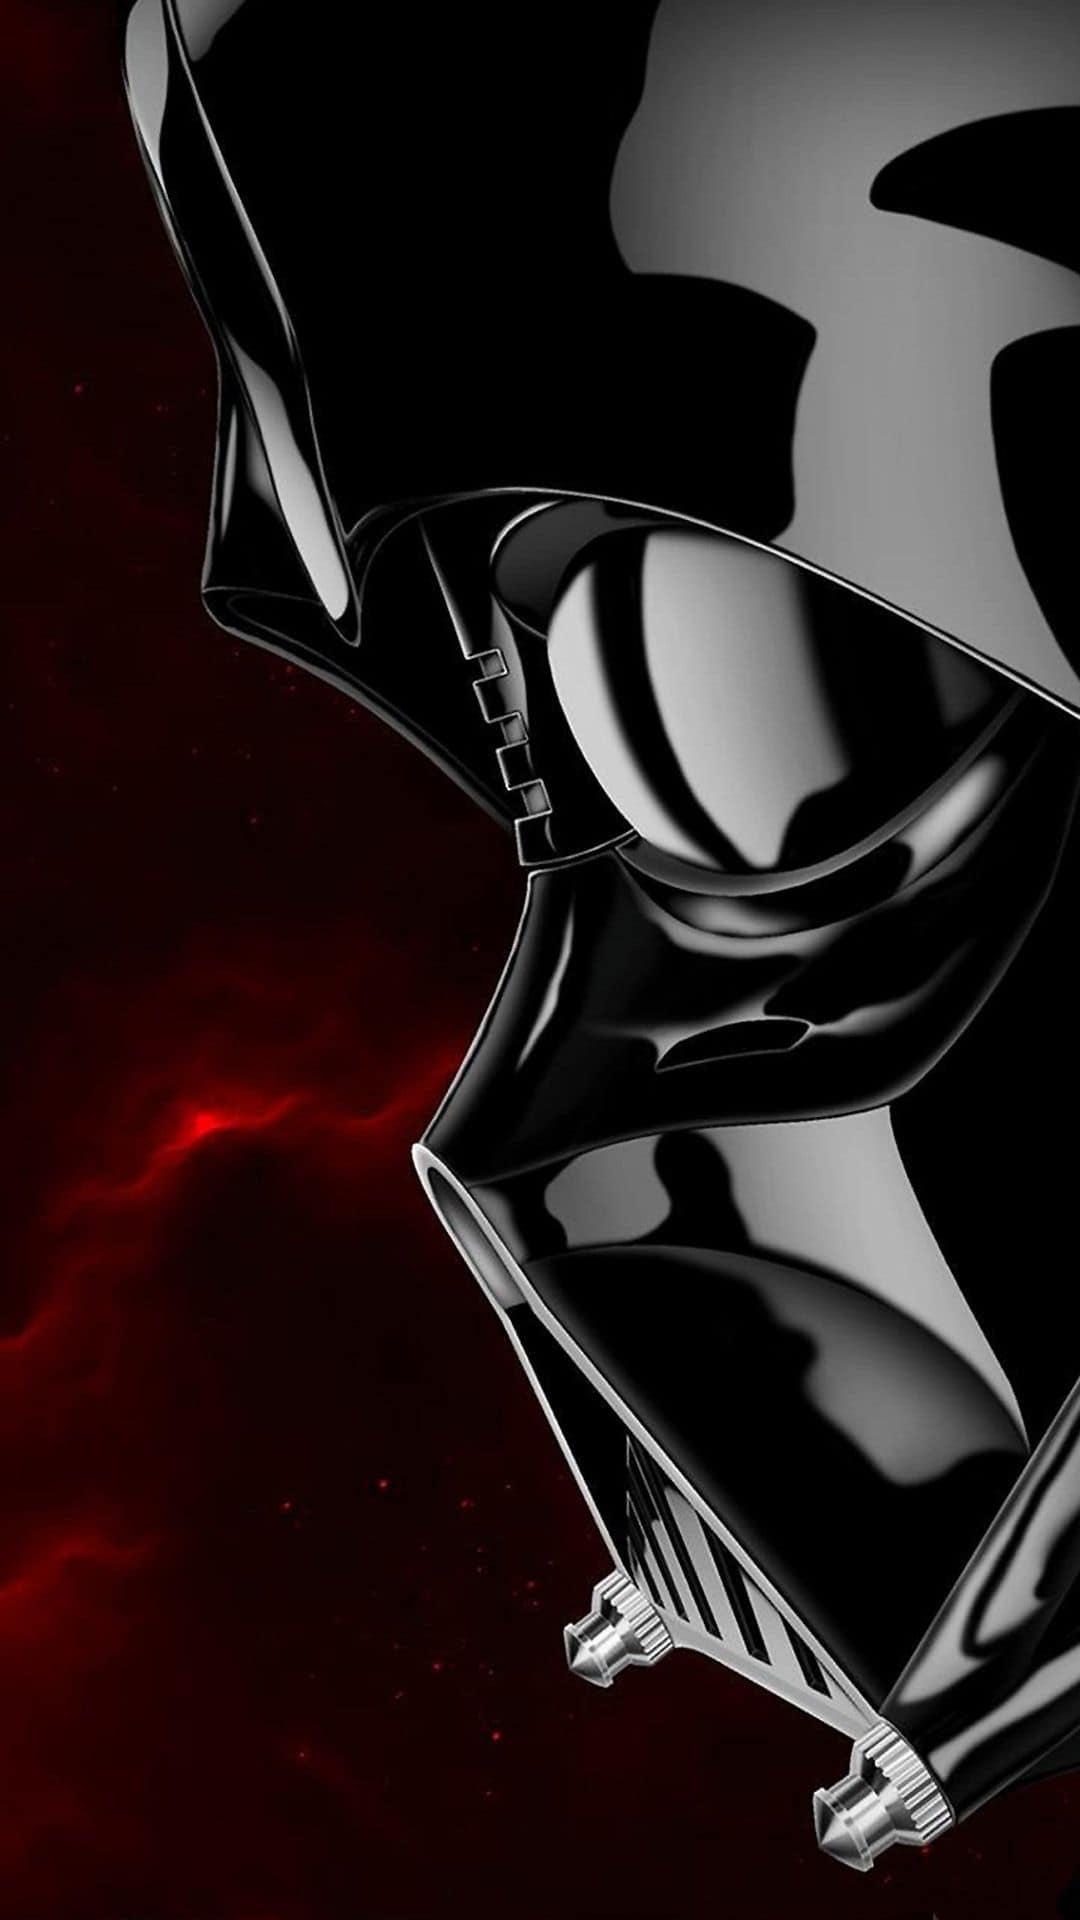 Download This Wallpaper - Star Wars Wallpaper Iphone 7 Hd , HD Wallpaper & Backgrounds